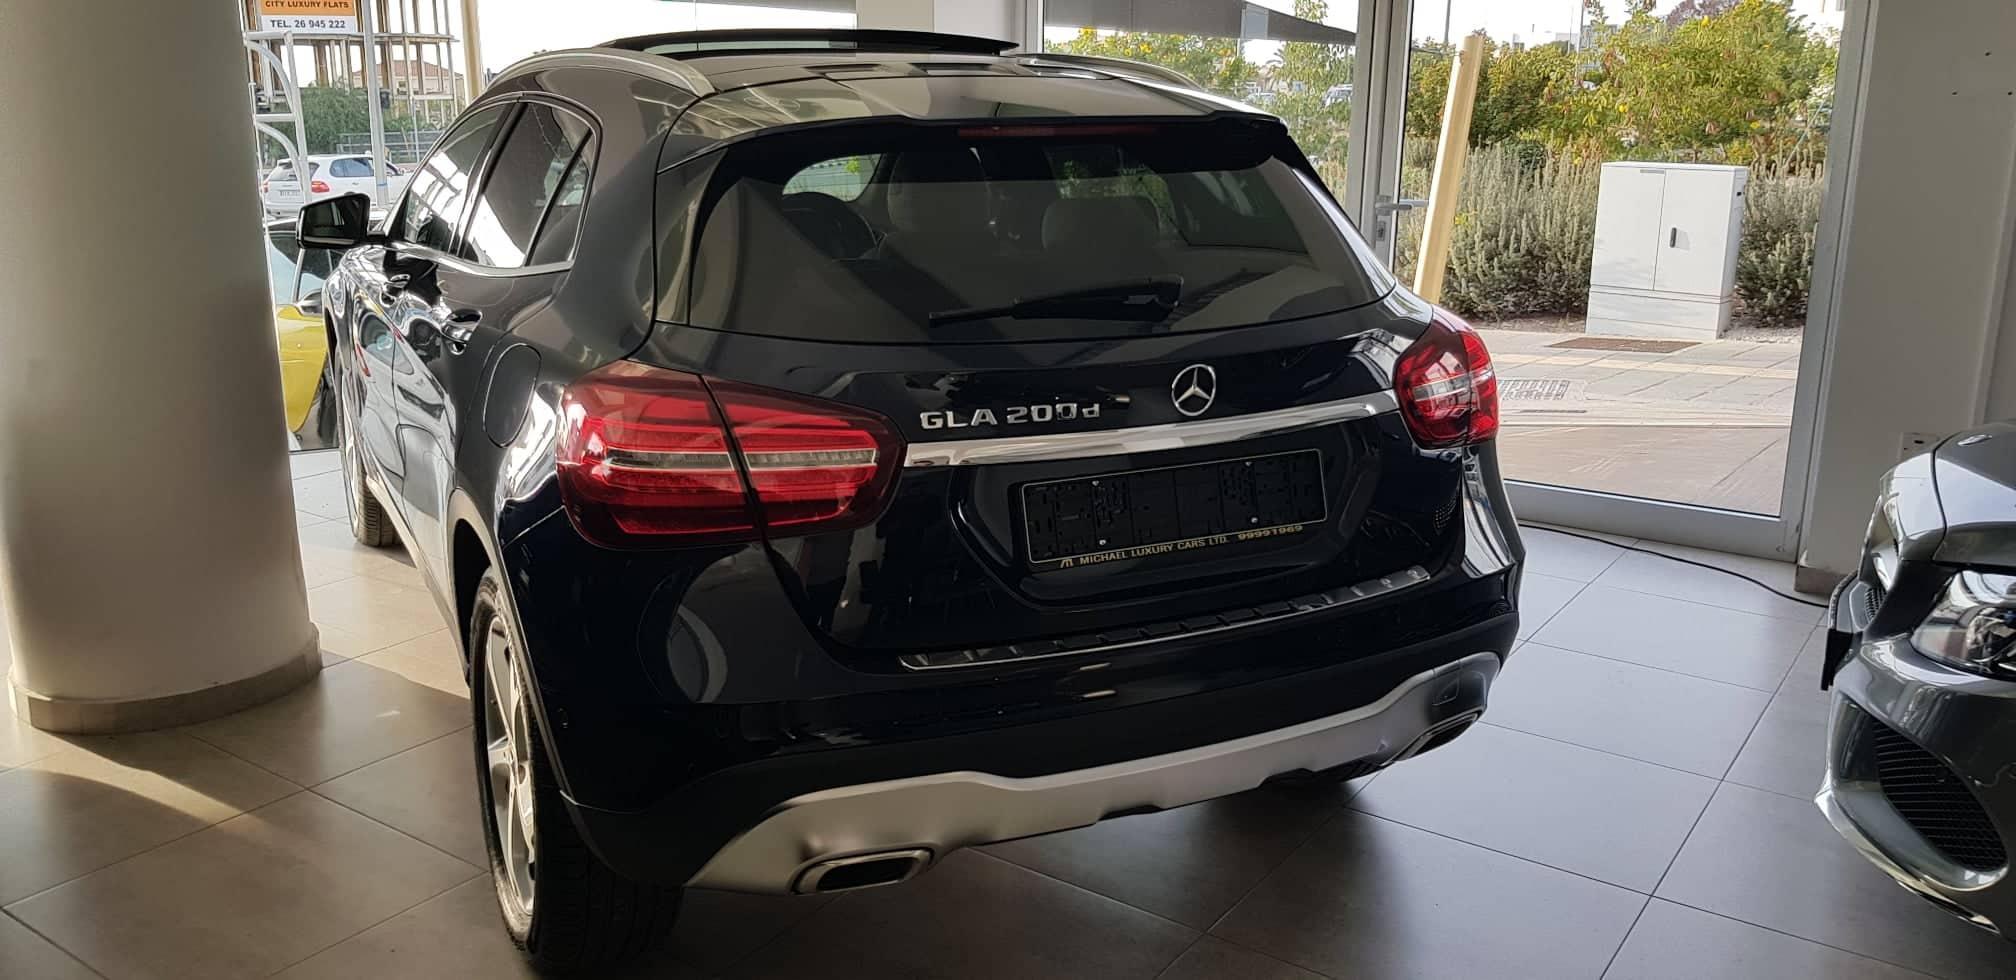 Mercedes Benz GLA 200 D Sport Premium Auto